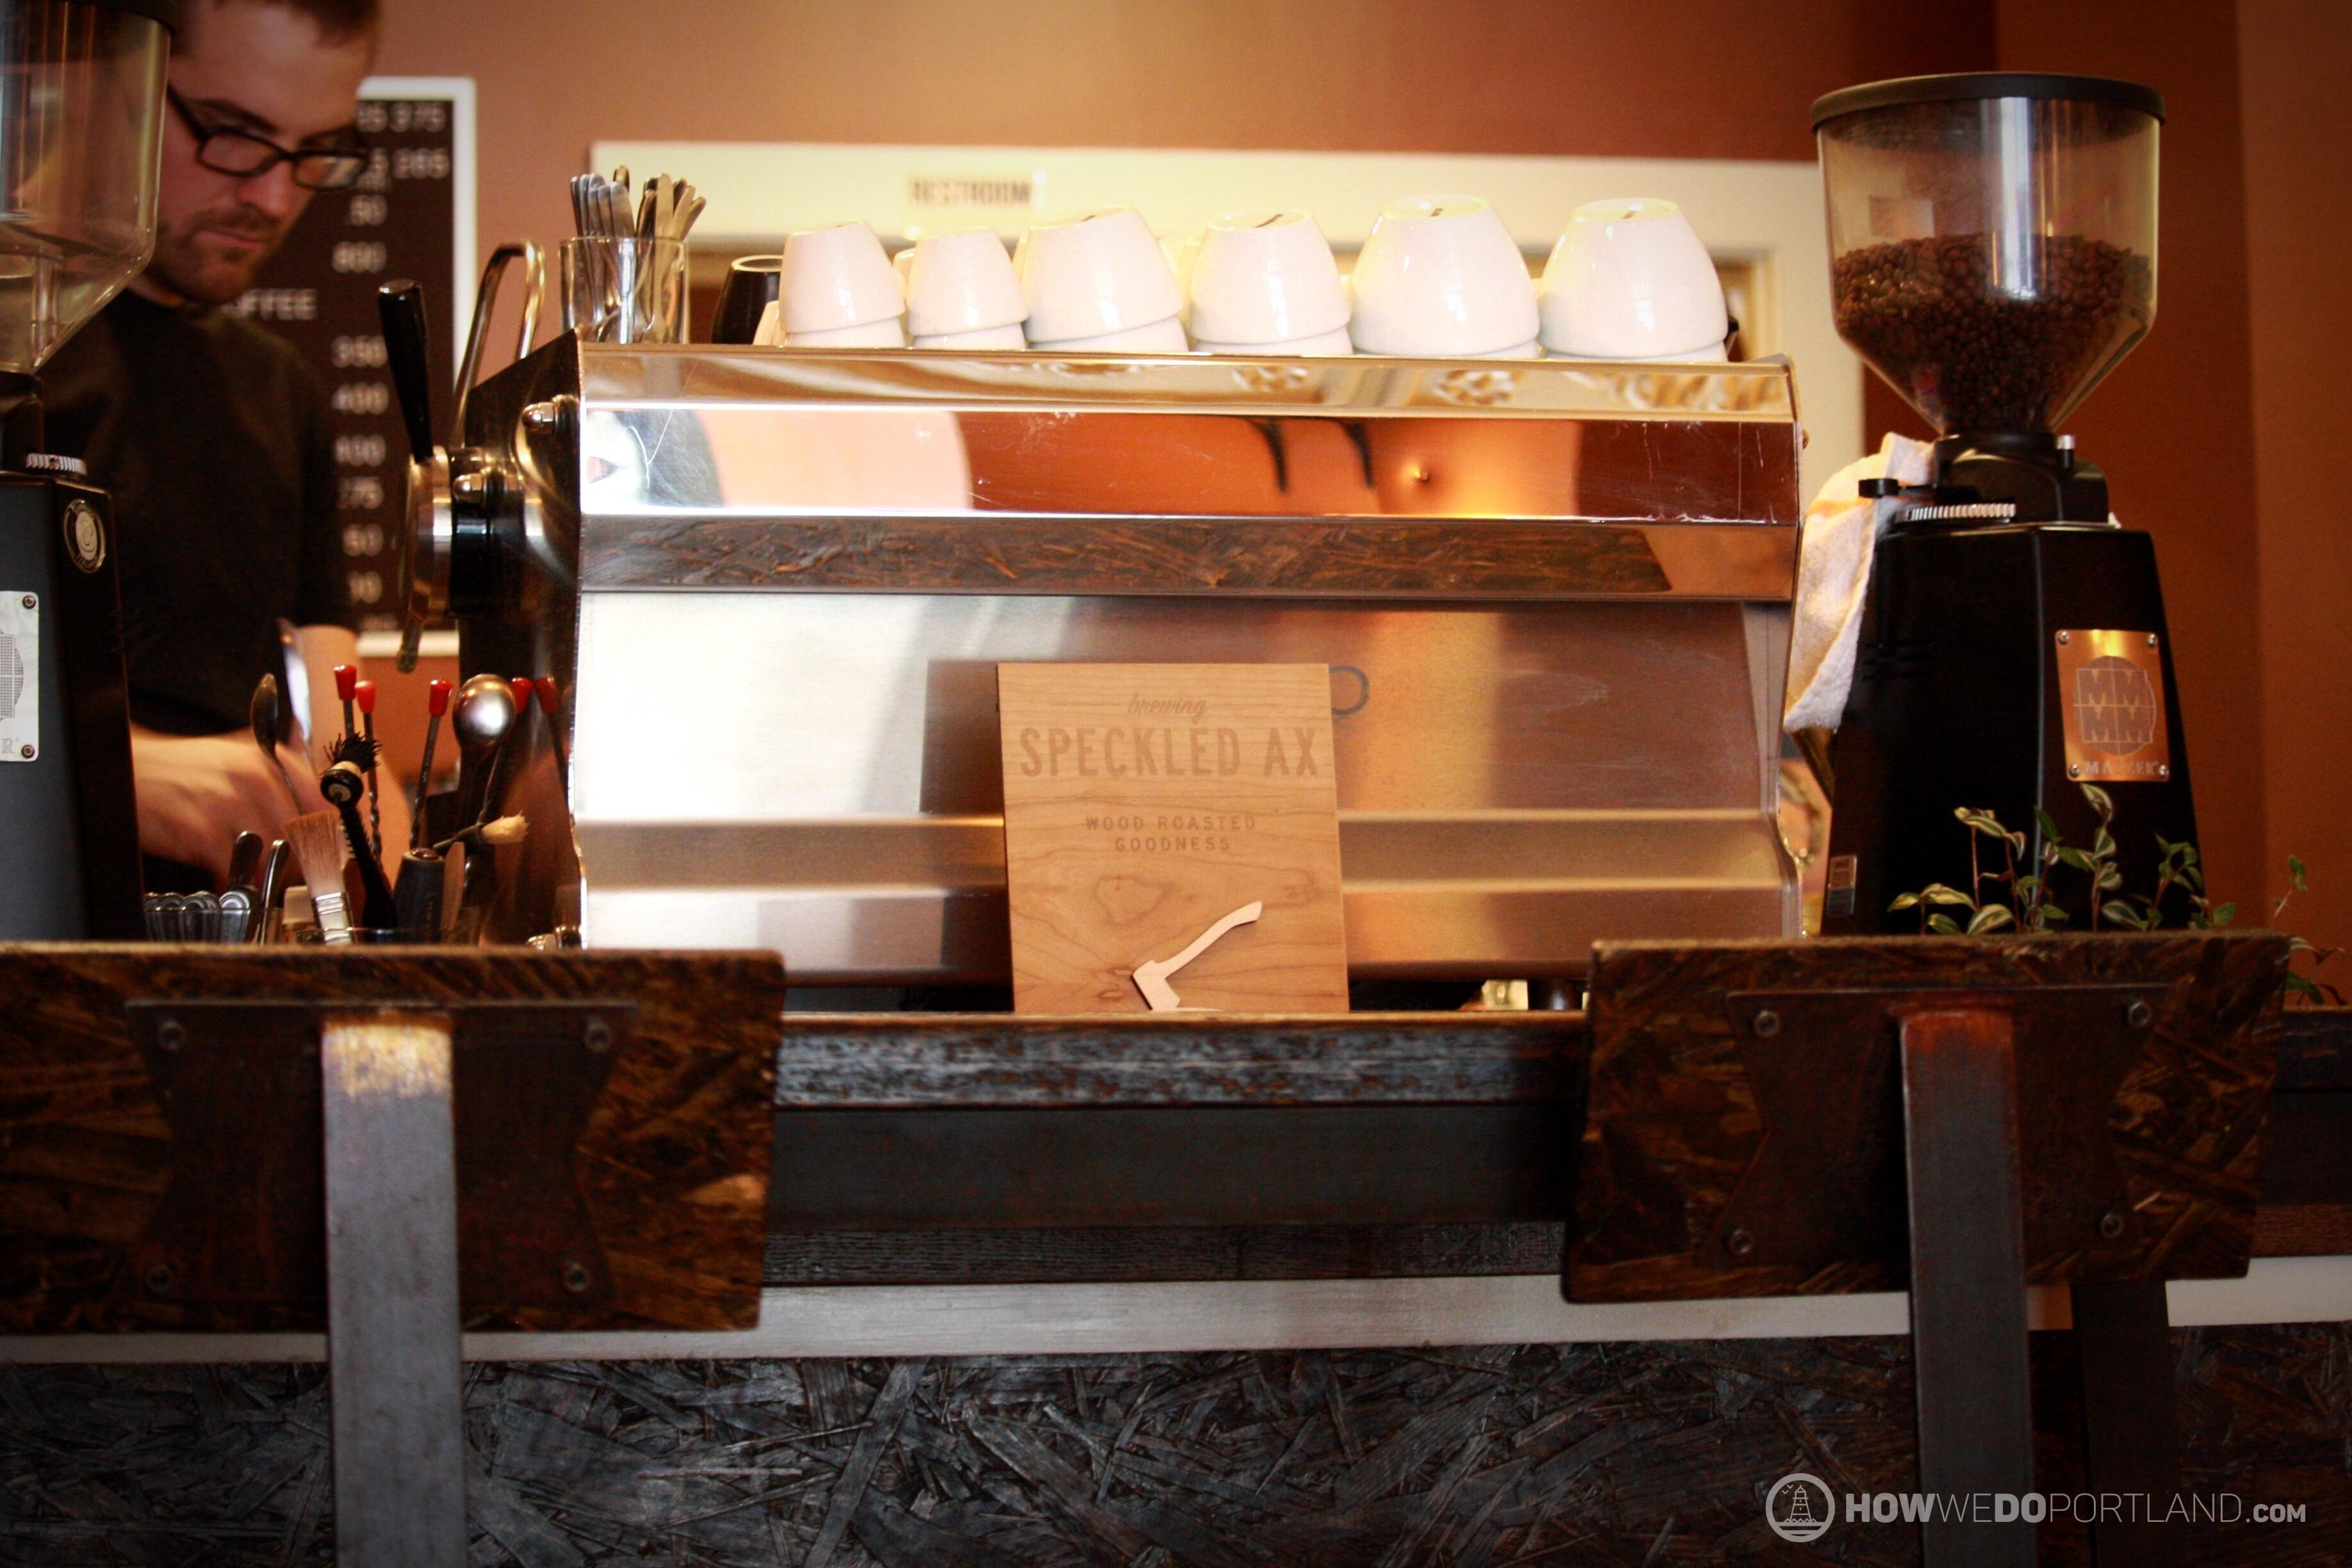 Speckled Ax Espresso